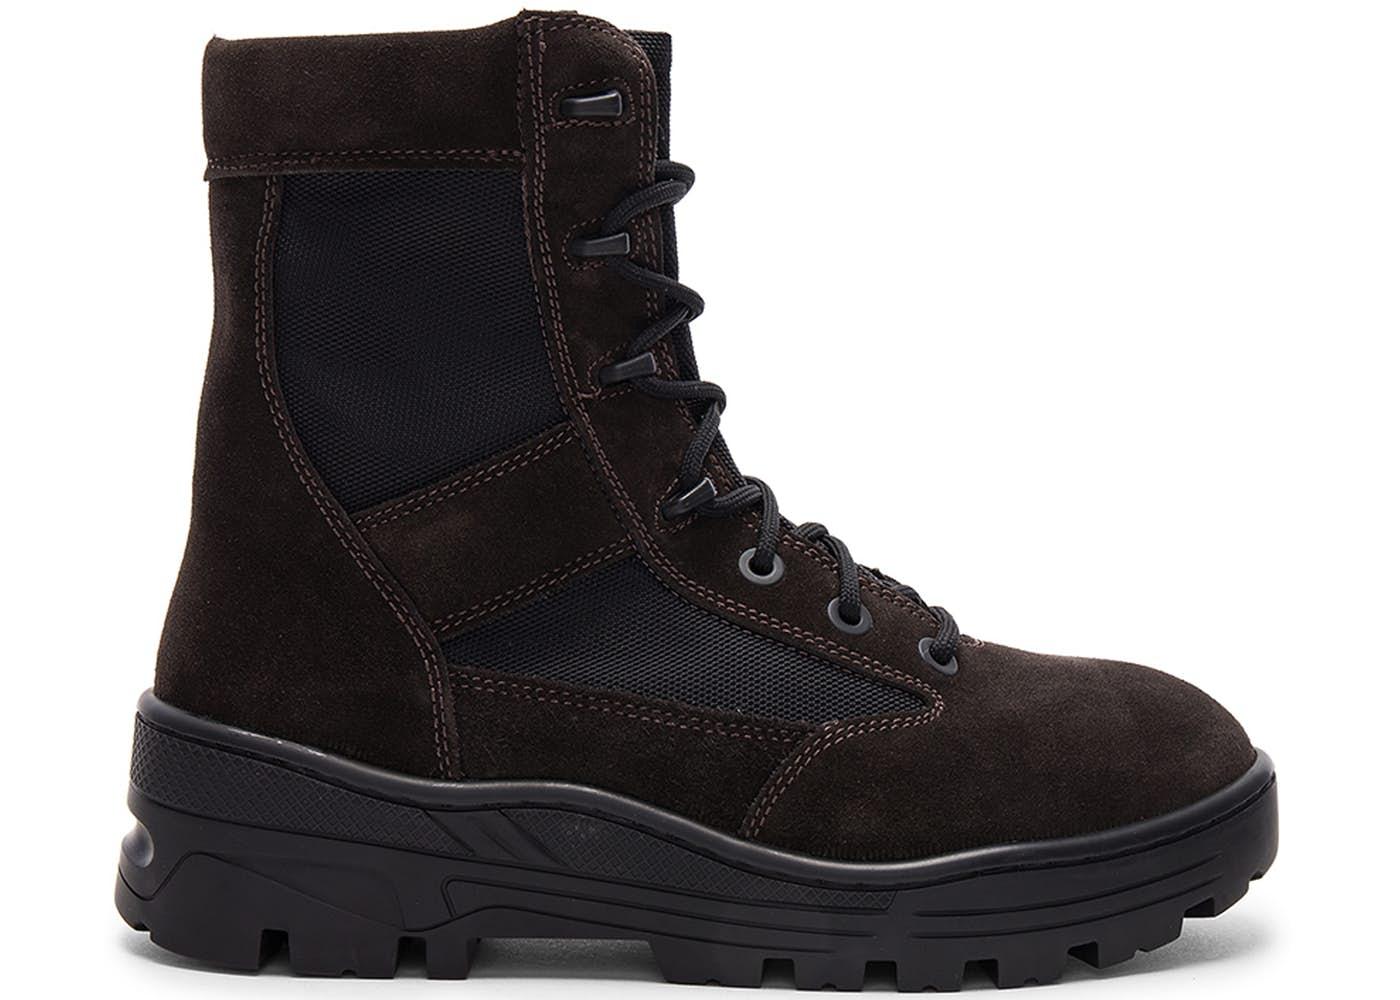 Yeezy Season 4 Combat Boot